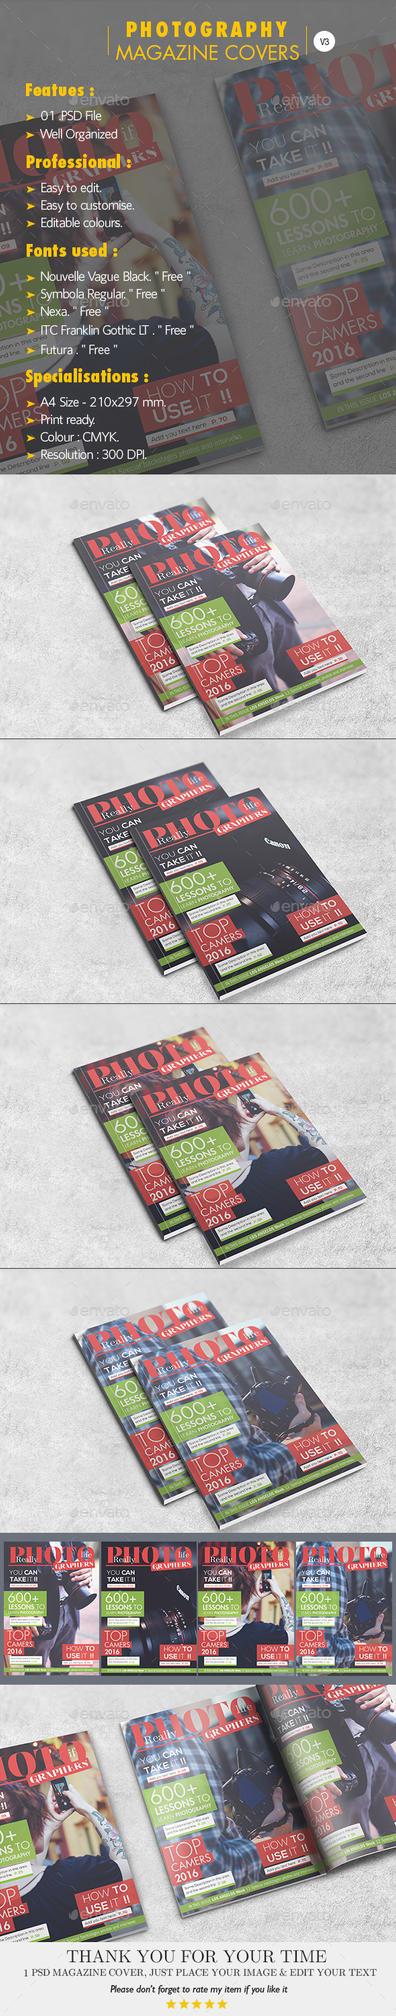 Photography Magazine Covers V.03 by Hz-designer